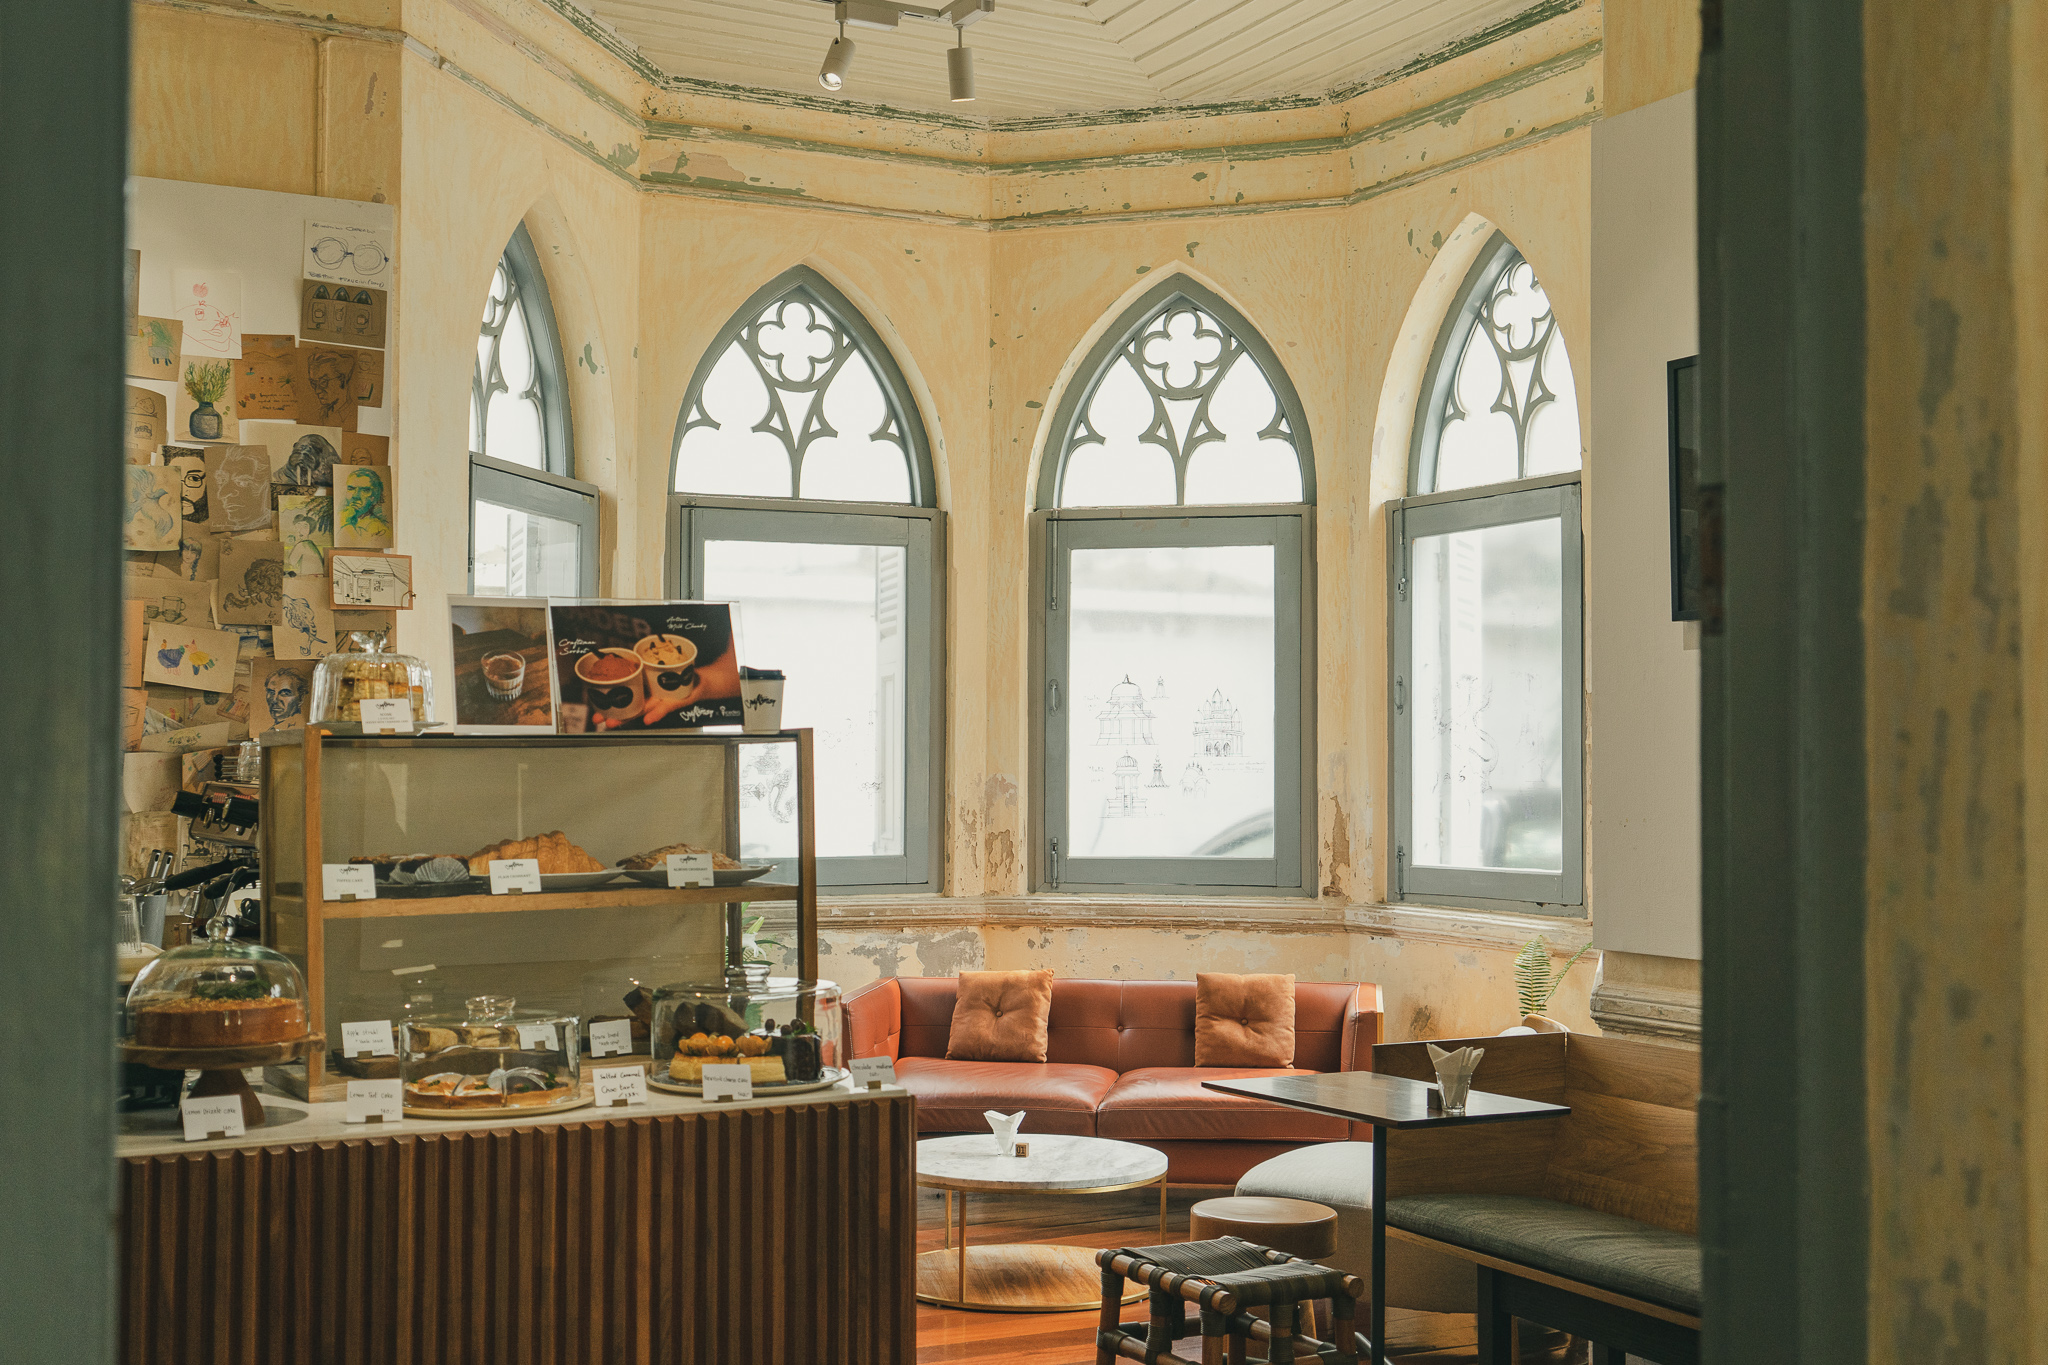 「Craftsman at Silpa Bhirasri's place」@バンコク・ドゥシット地区のカフェ